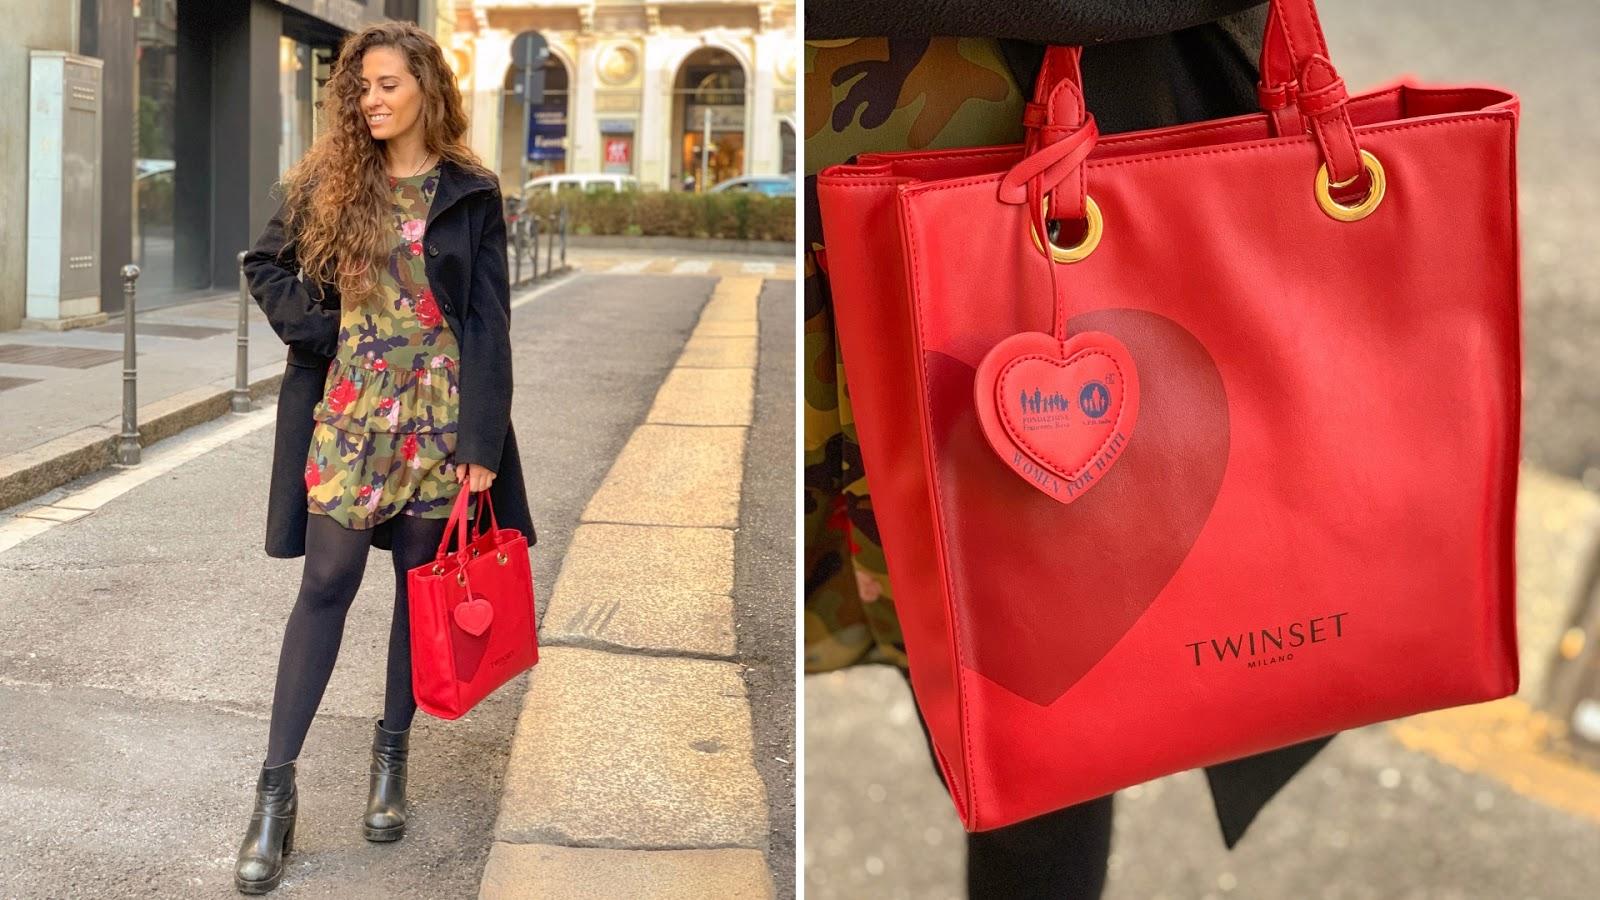 ce645a8709 Twinset: la nuova borsa